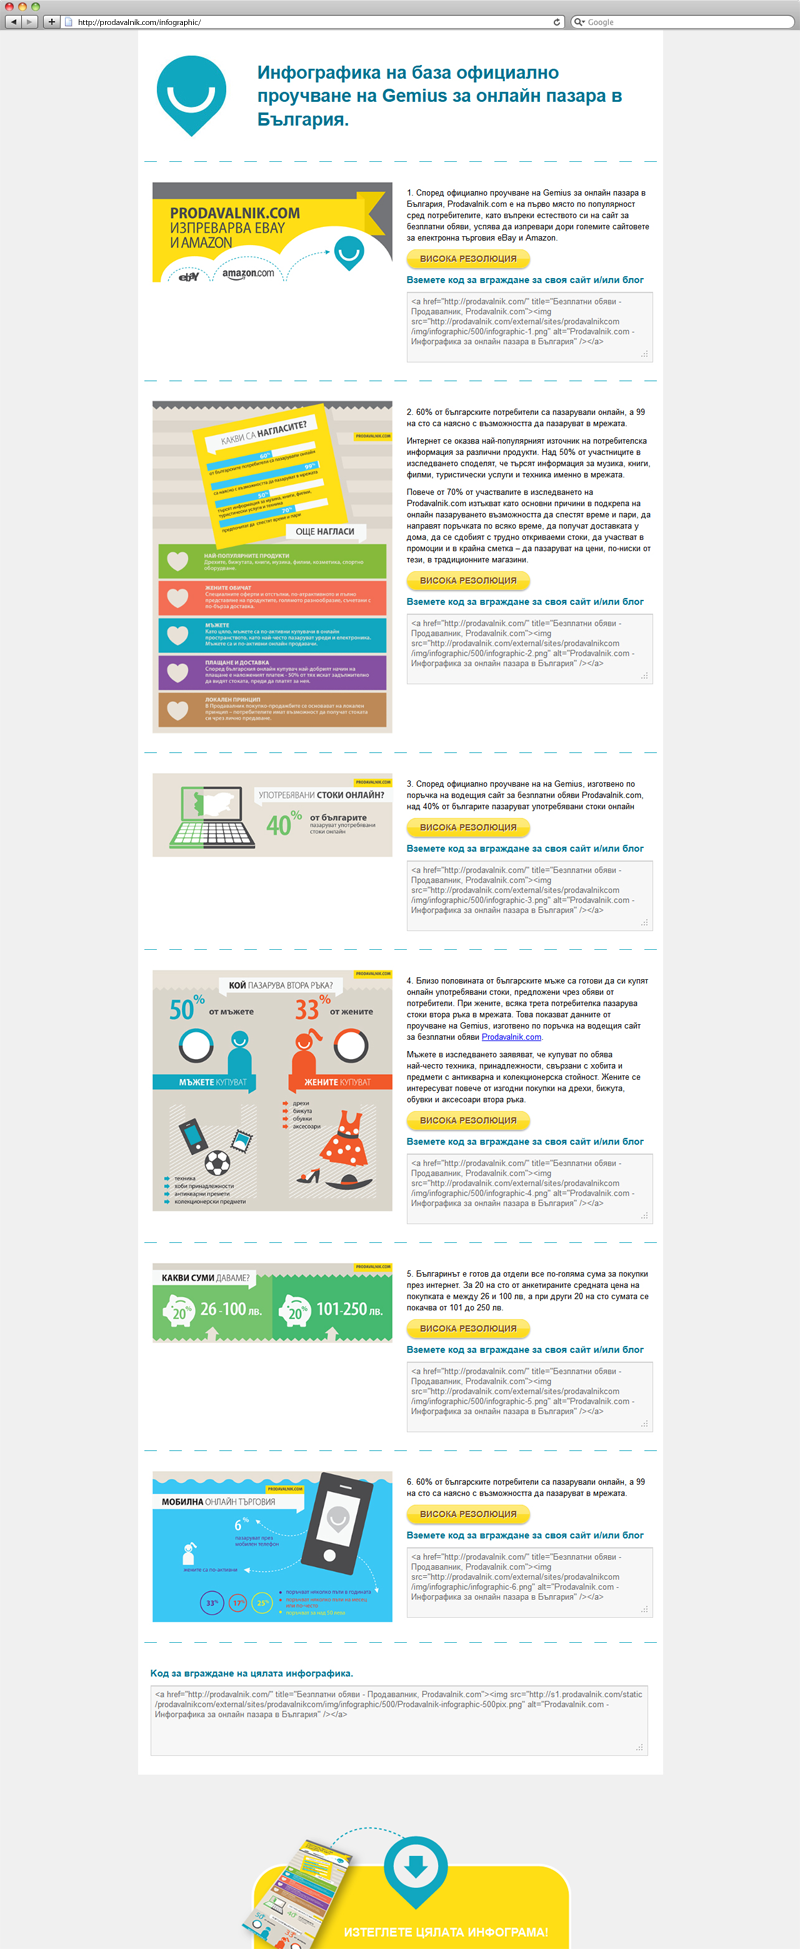 online retailer infographic design